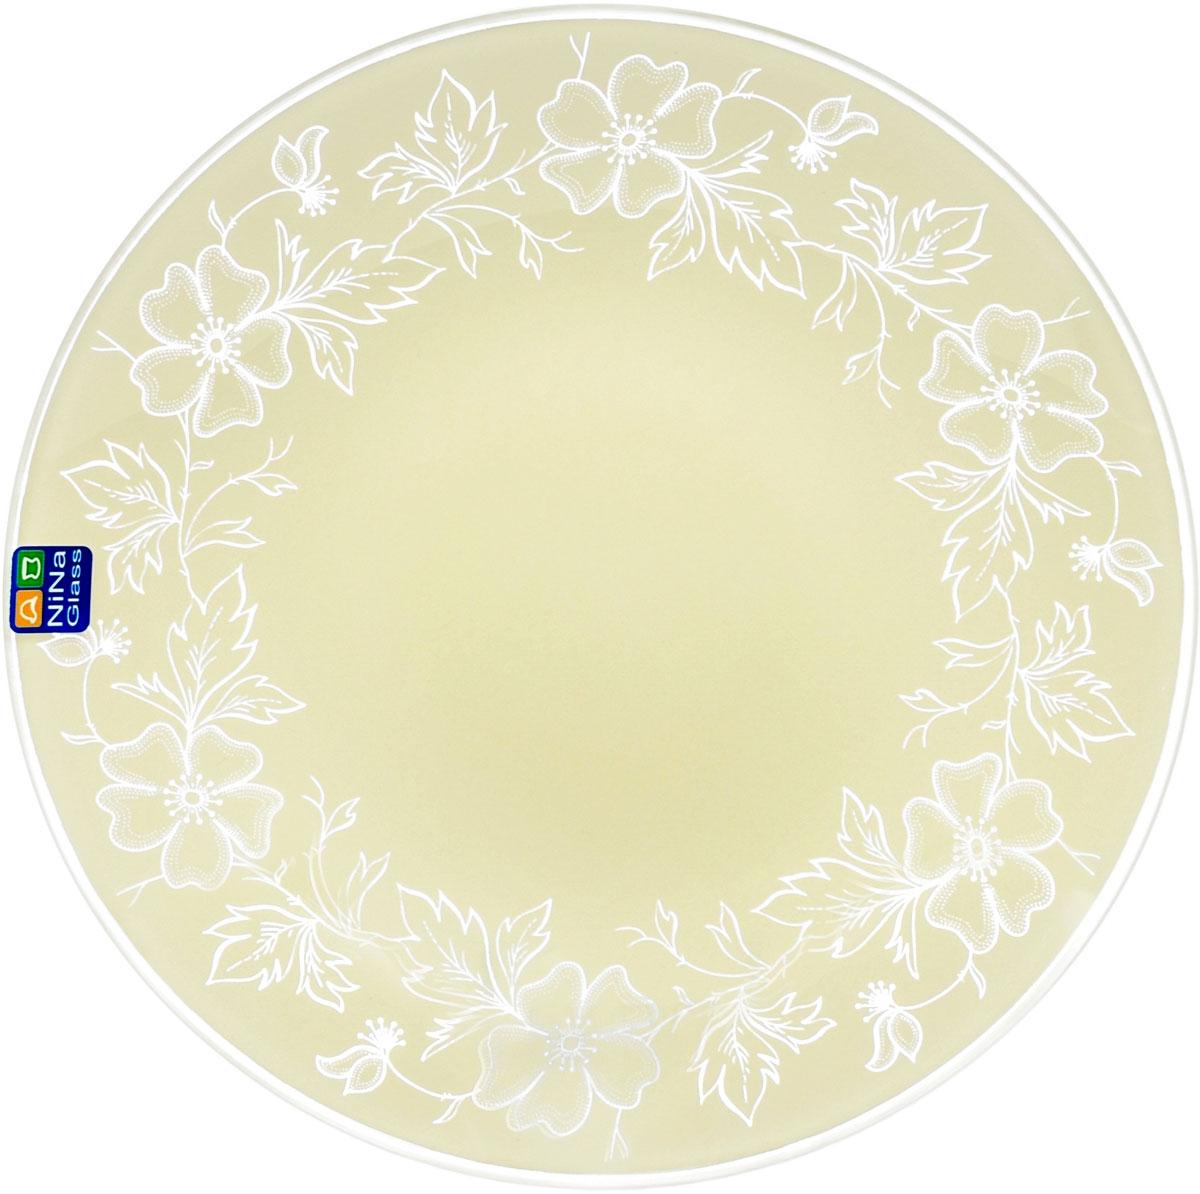 Тарелка круглая Nina Glass Лара, цвет: белый, диаметр 20 см салатник nina glass ажур цвет сиреневый диаметр 16 см